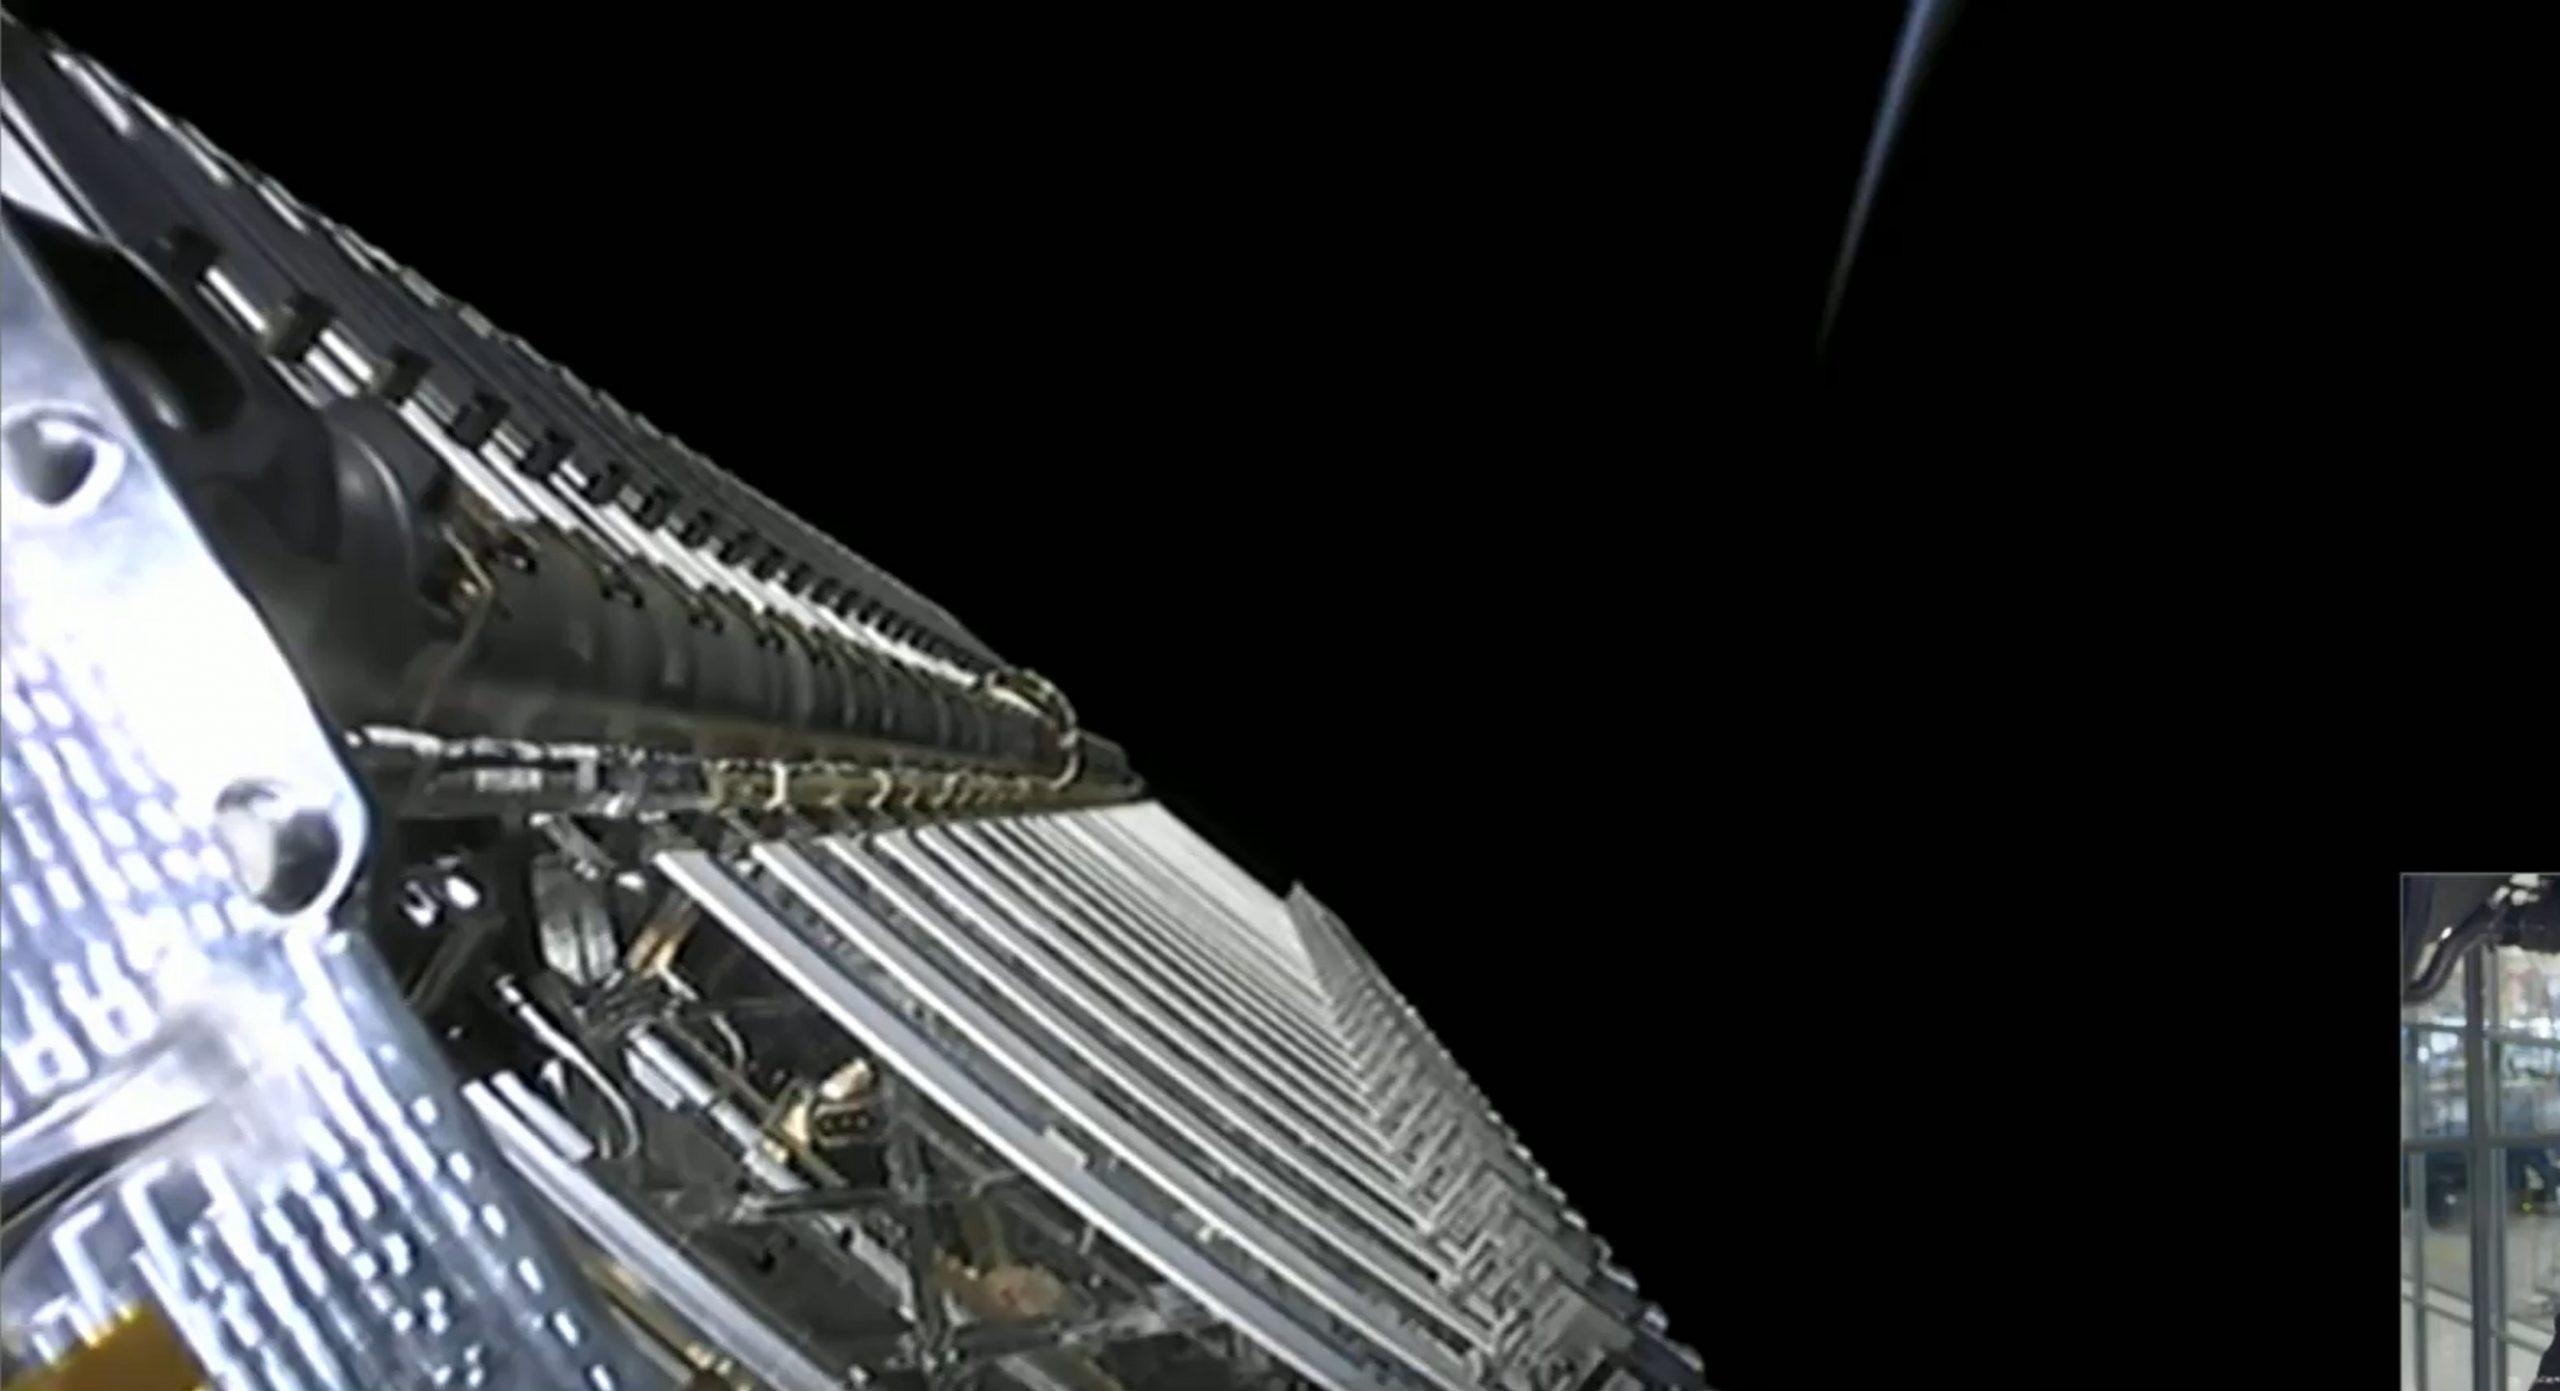 Starlink-9 BlackSky Falcon 9 B1051 080720 webcast (SpaceX) deploy 6